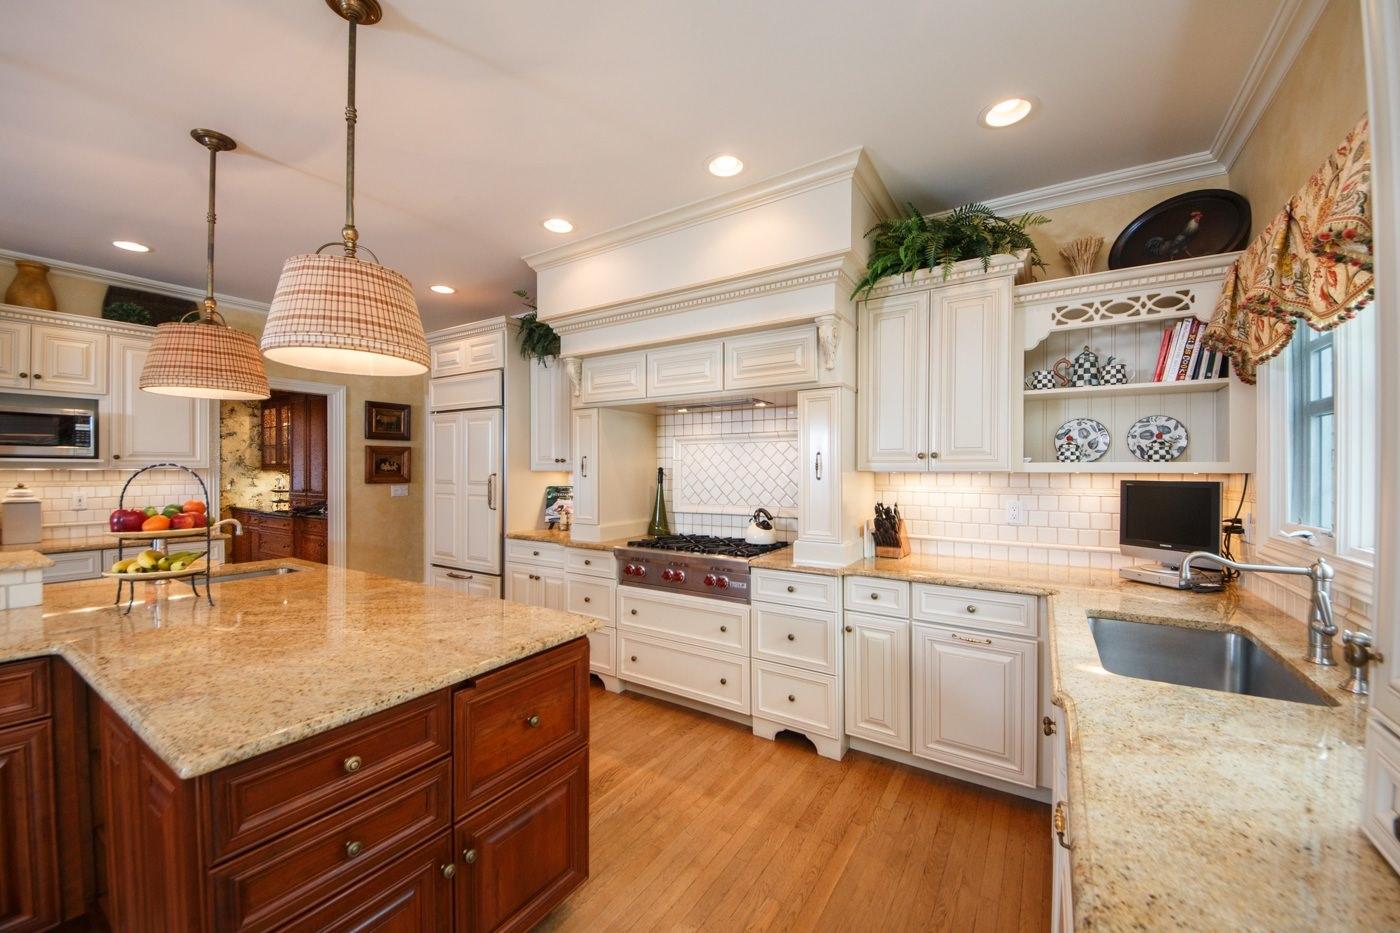 Kitchen cabinets summit nj - 111 Whittredge Rd Summit Nj 07901